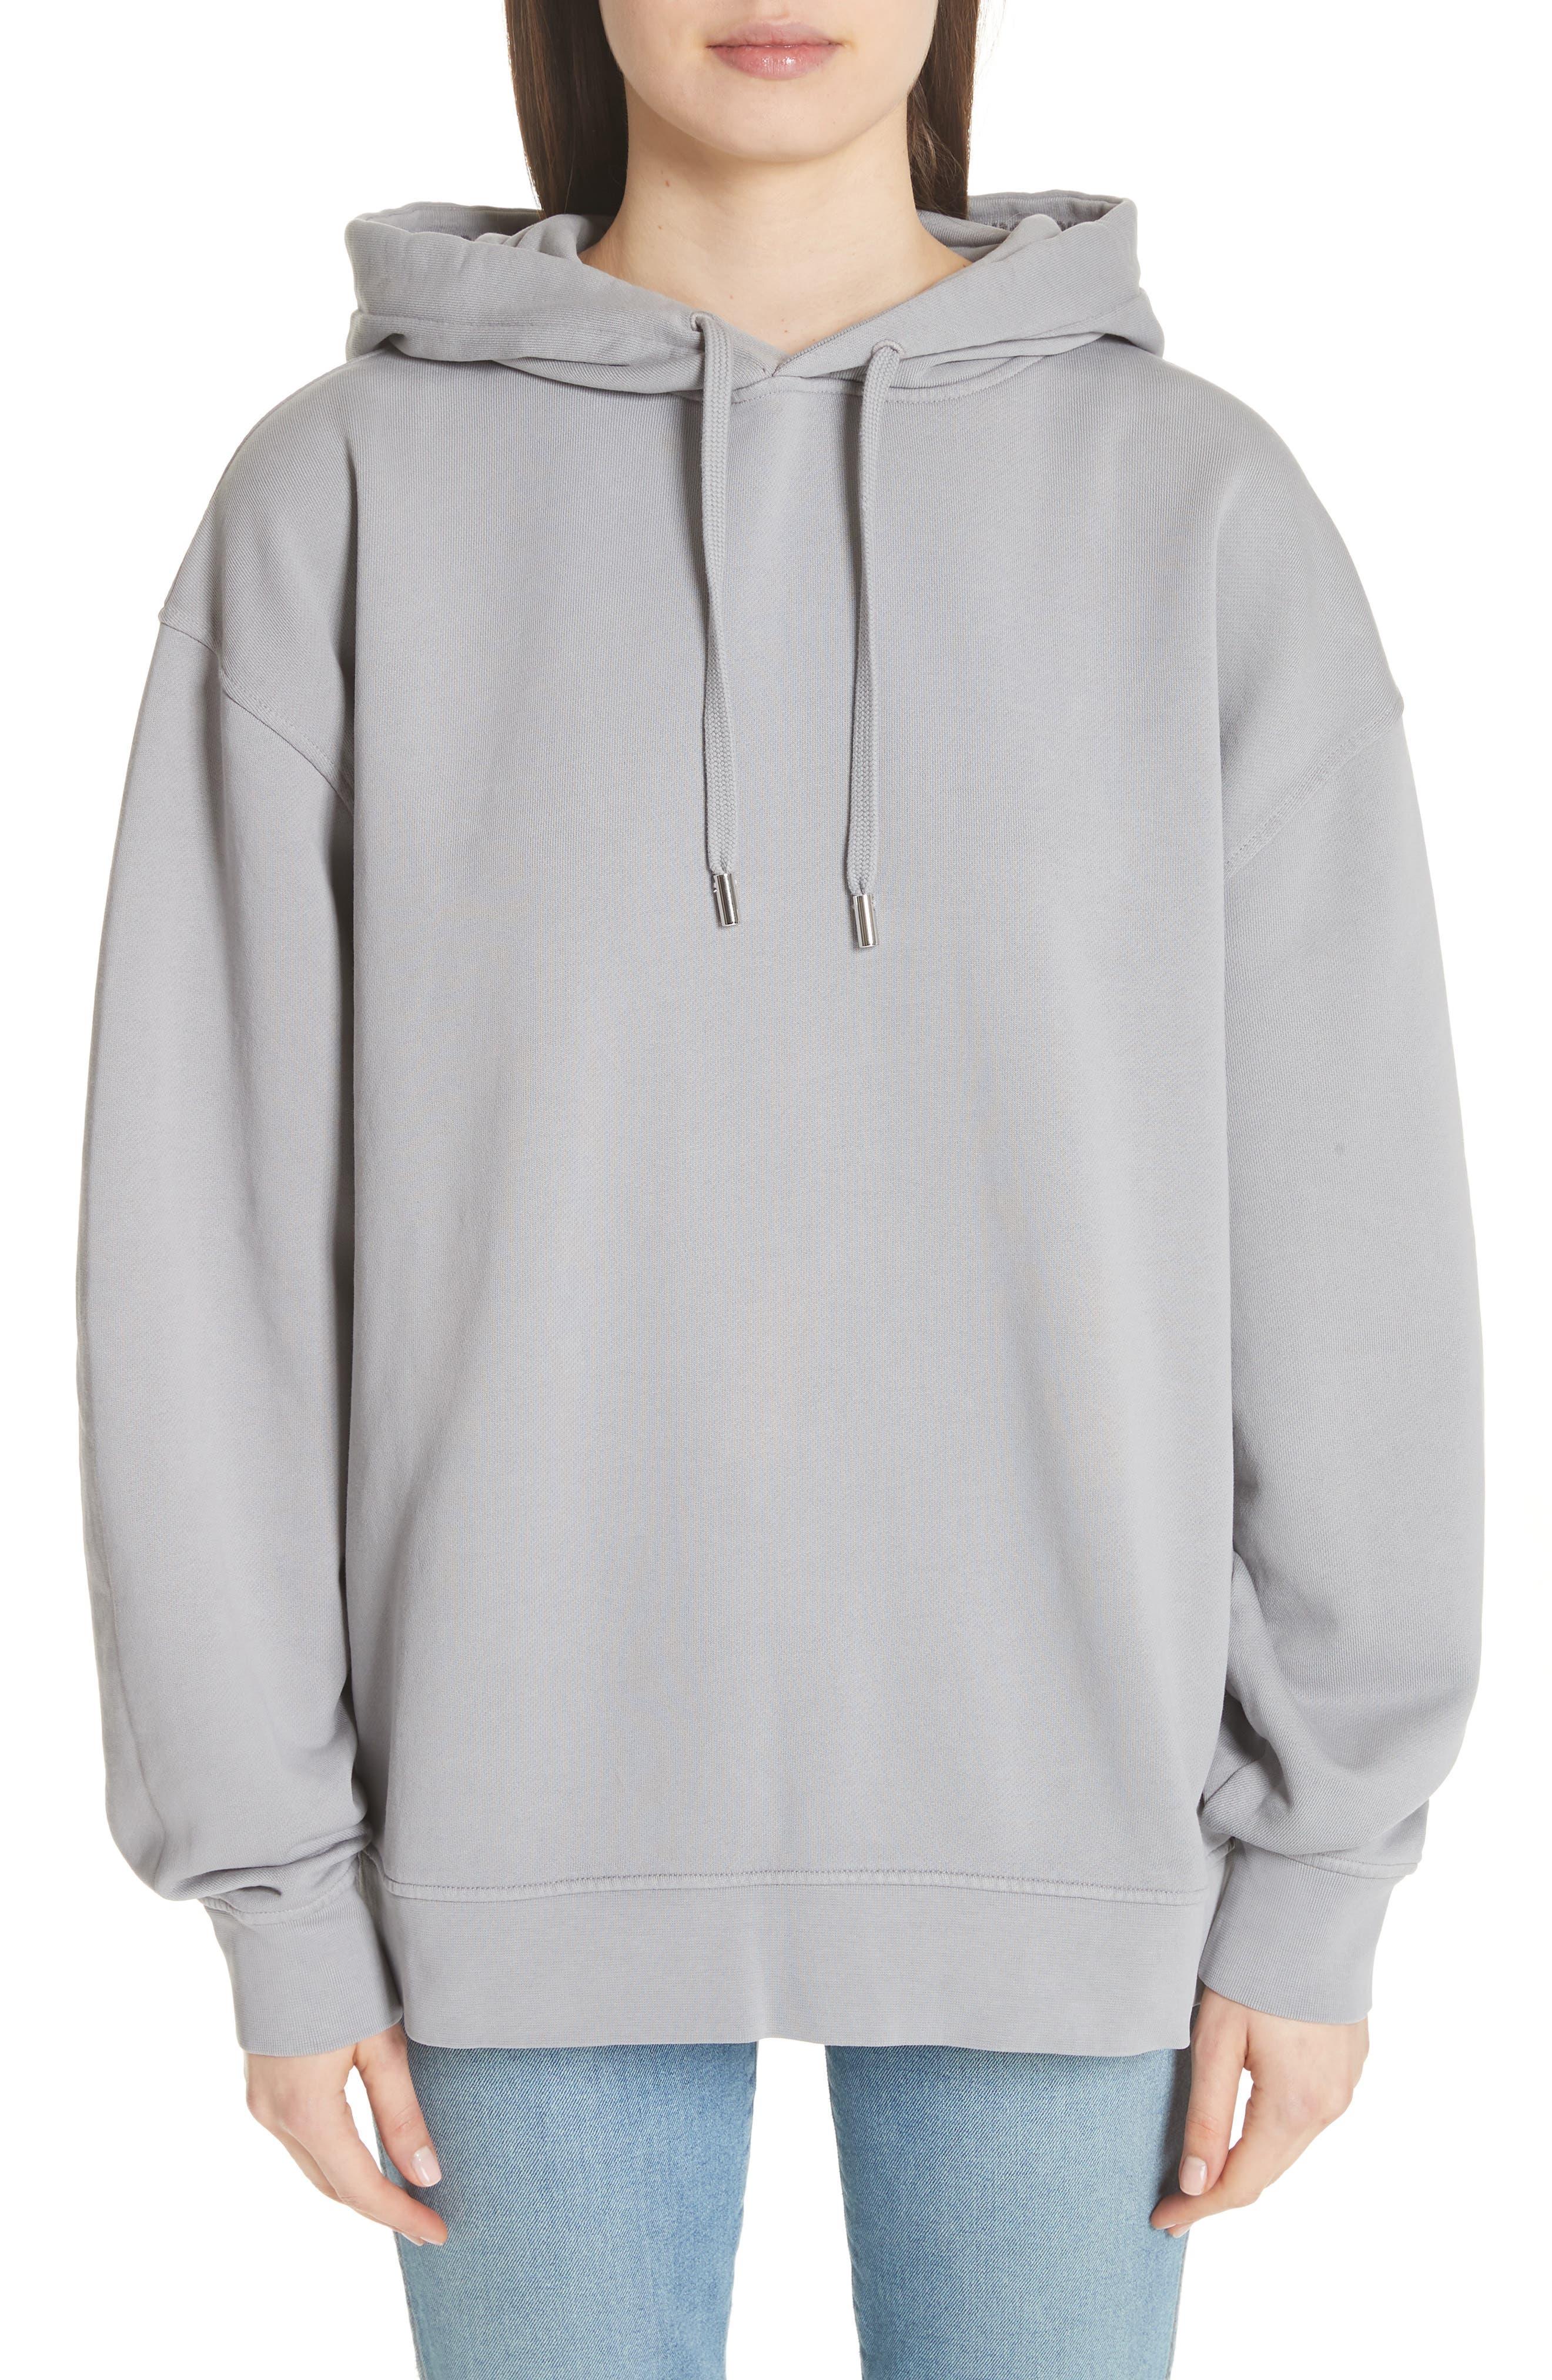 Yala Hoodie,                         Main,                         color, Slate Grey